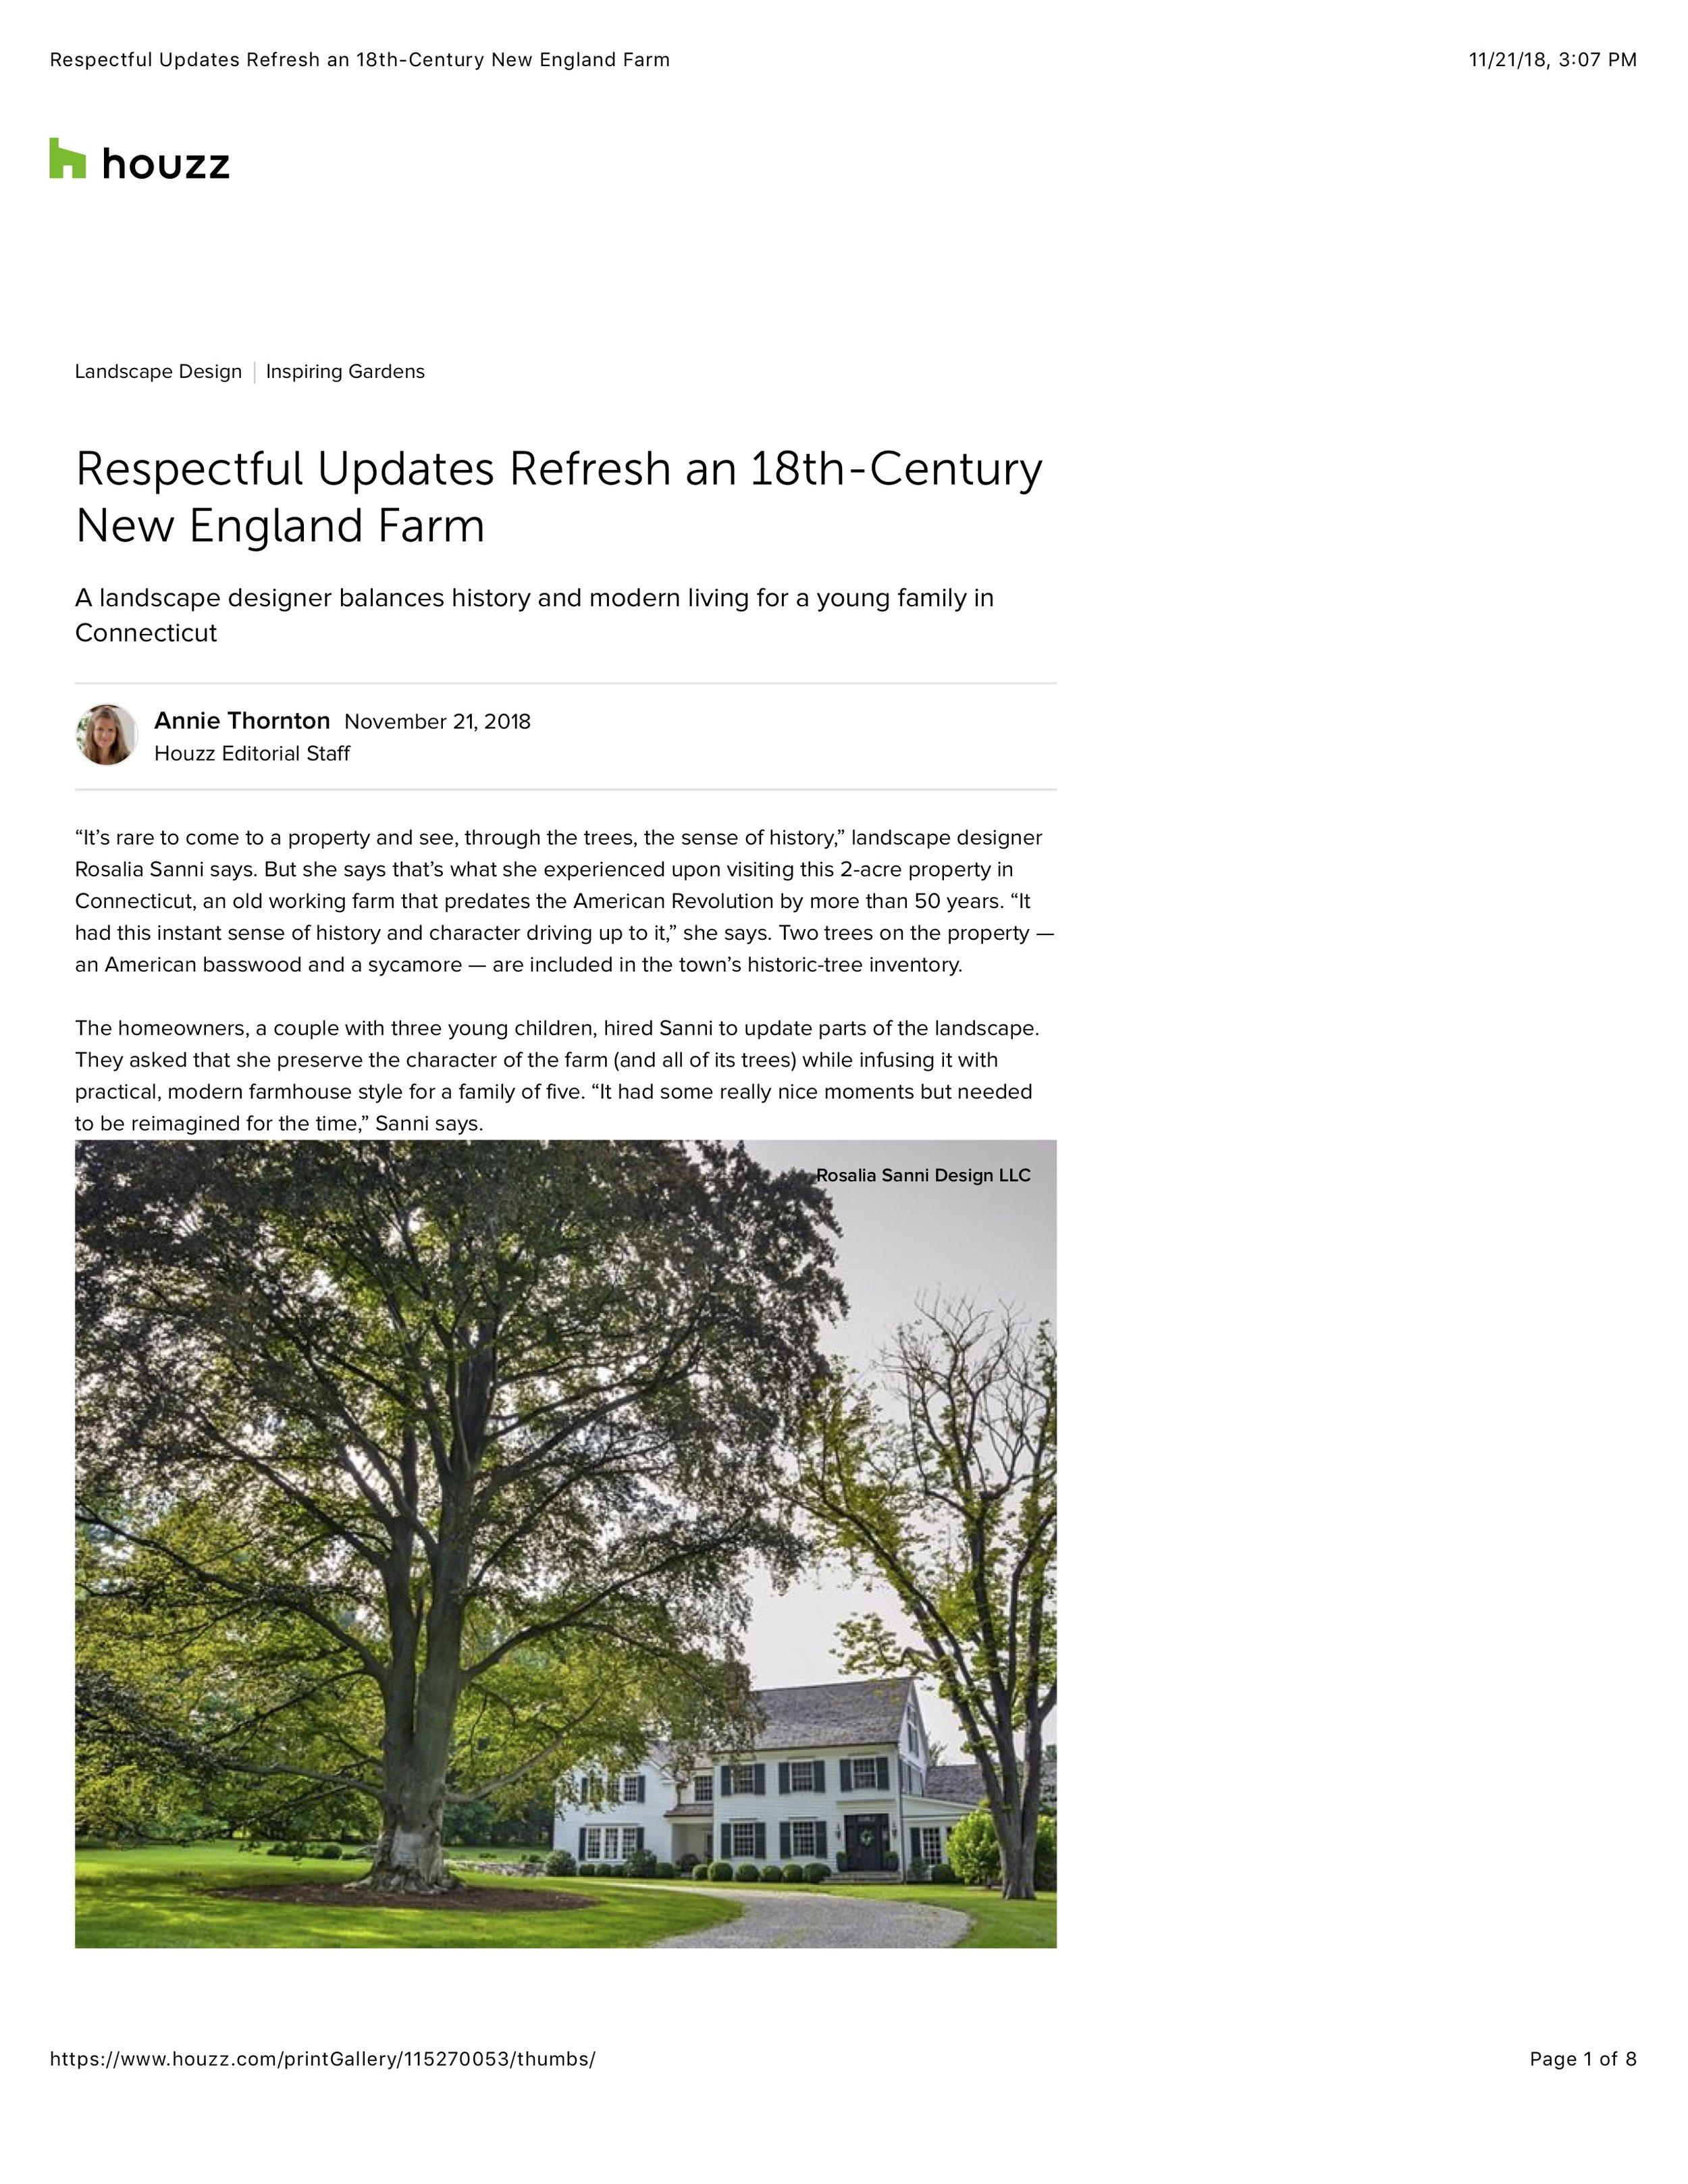 RSD Respectful Updates Refresh an 18th-Century New England Farm 1.jpg